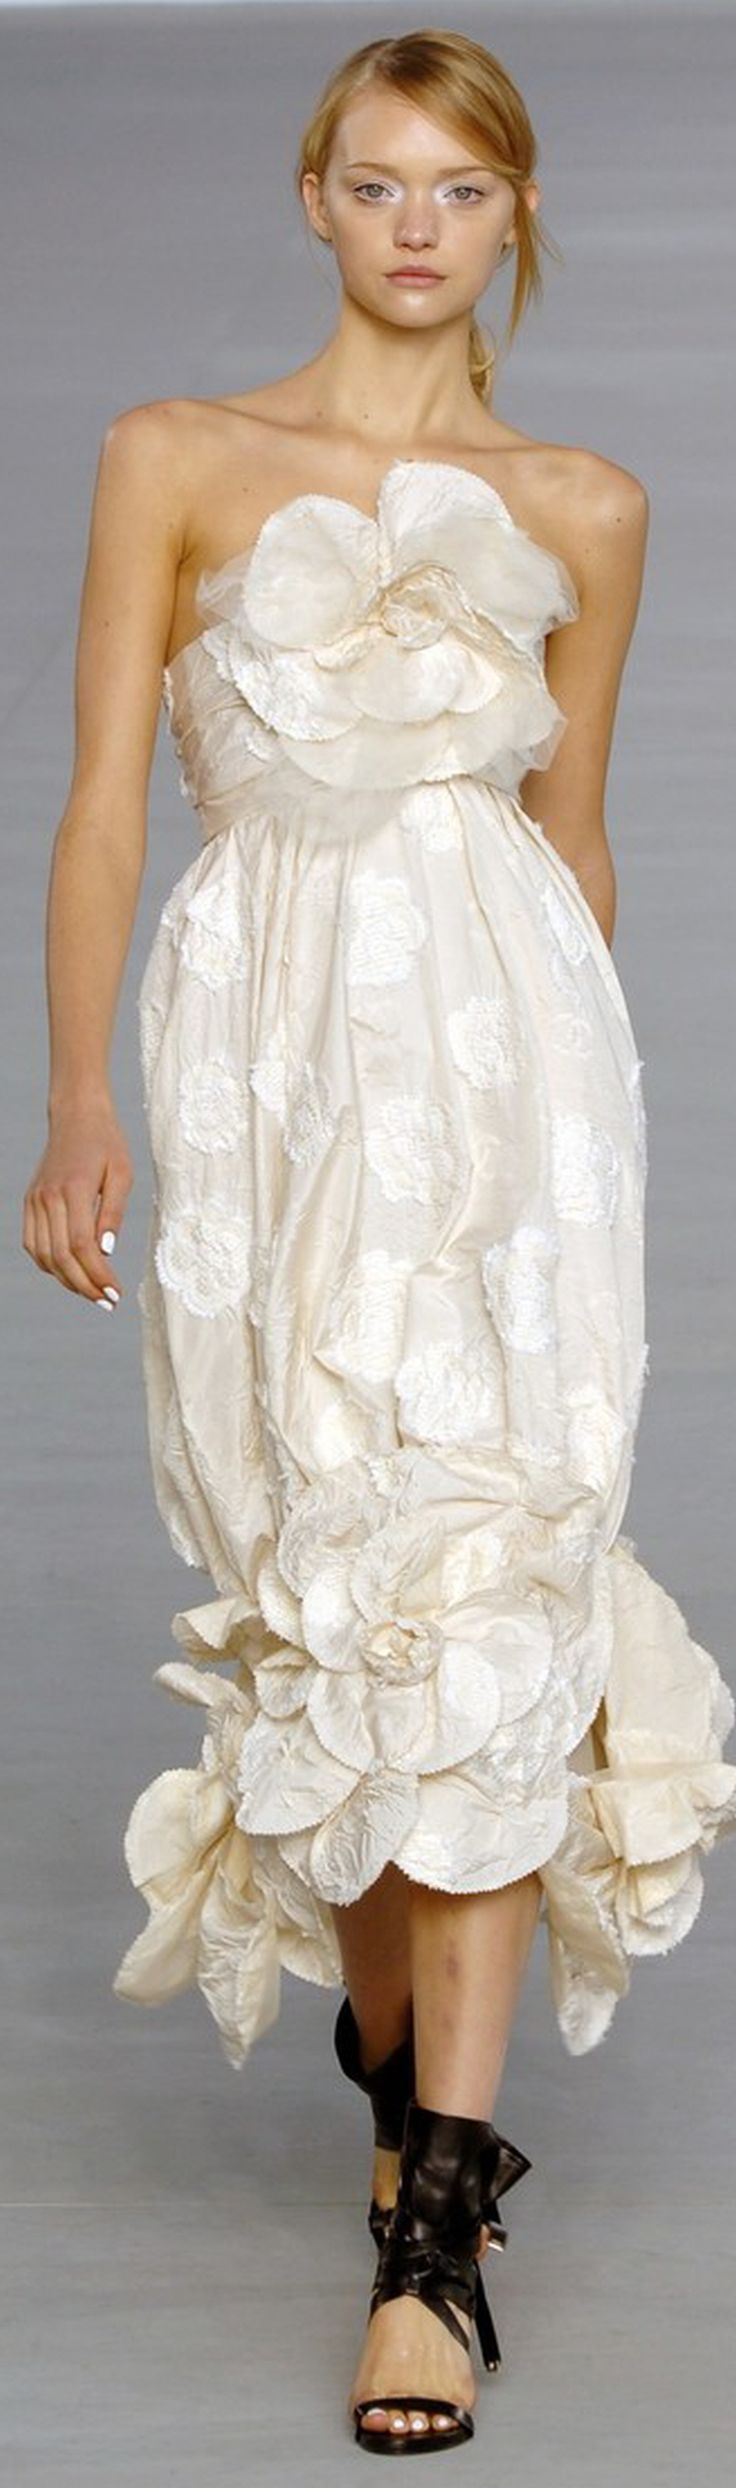 Chanel stylebistro.com